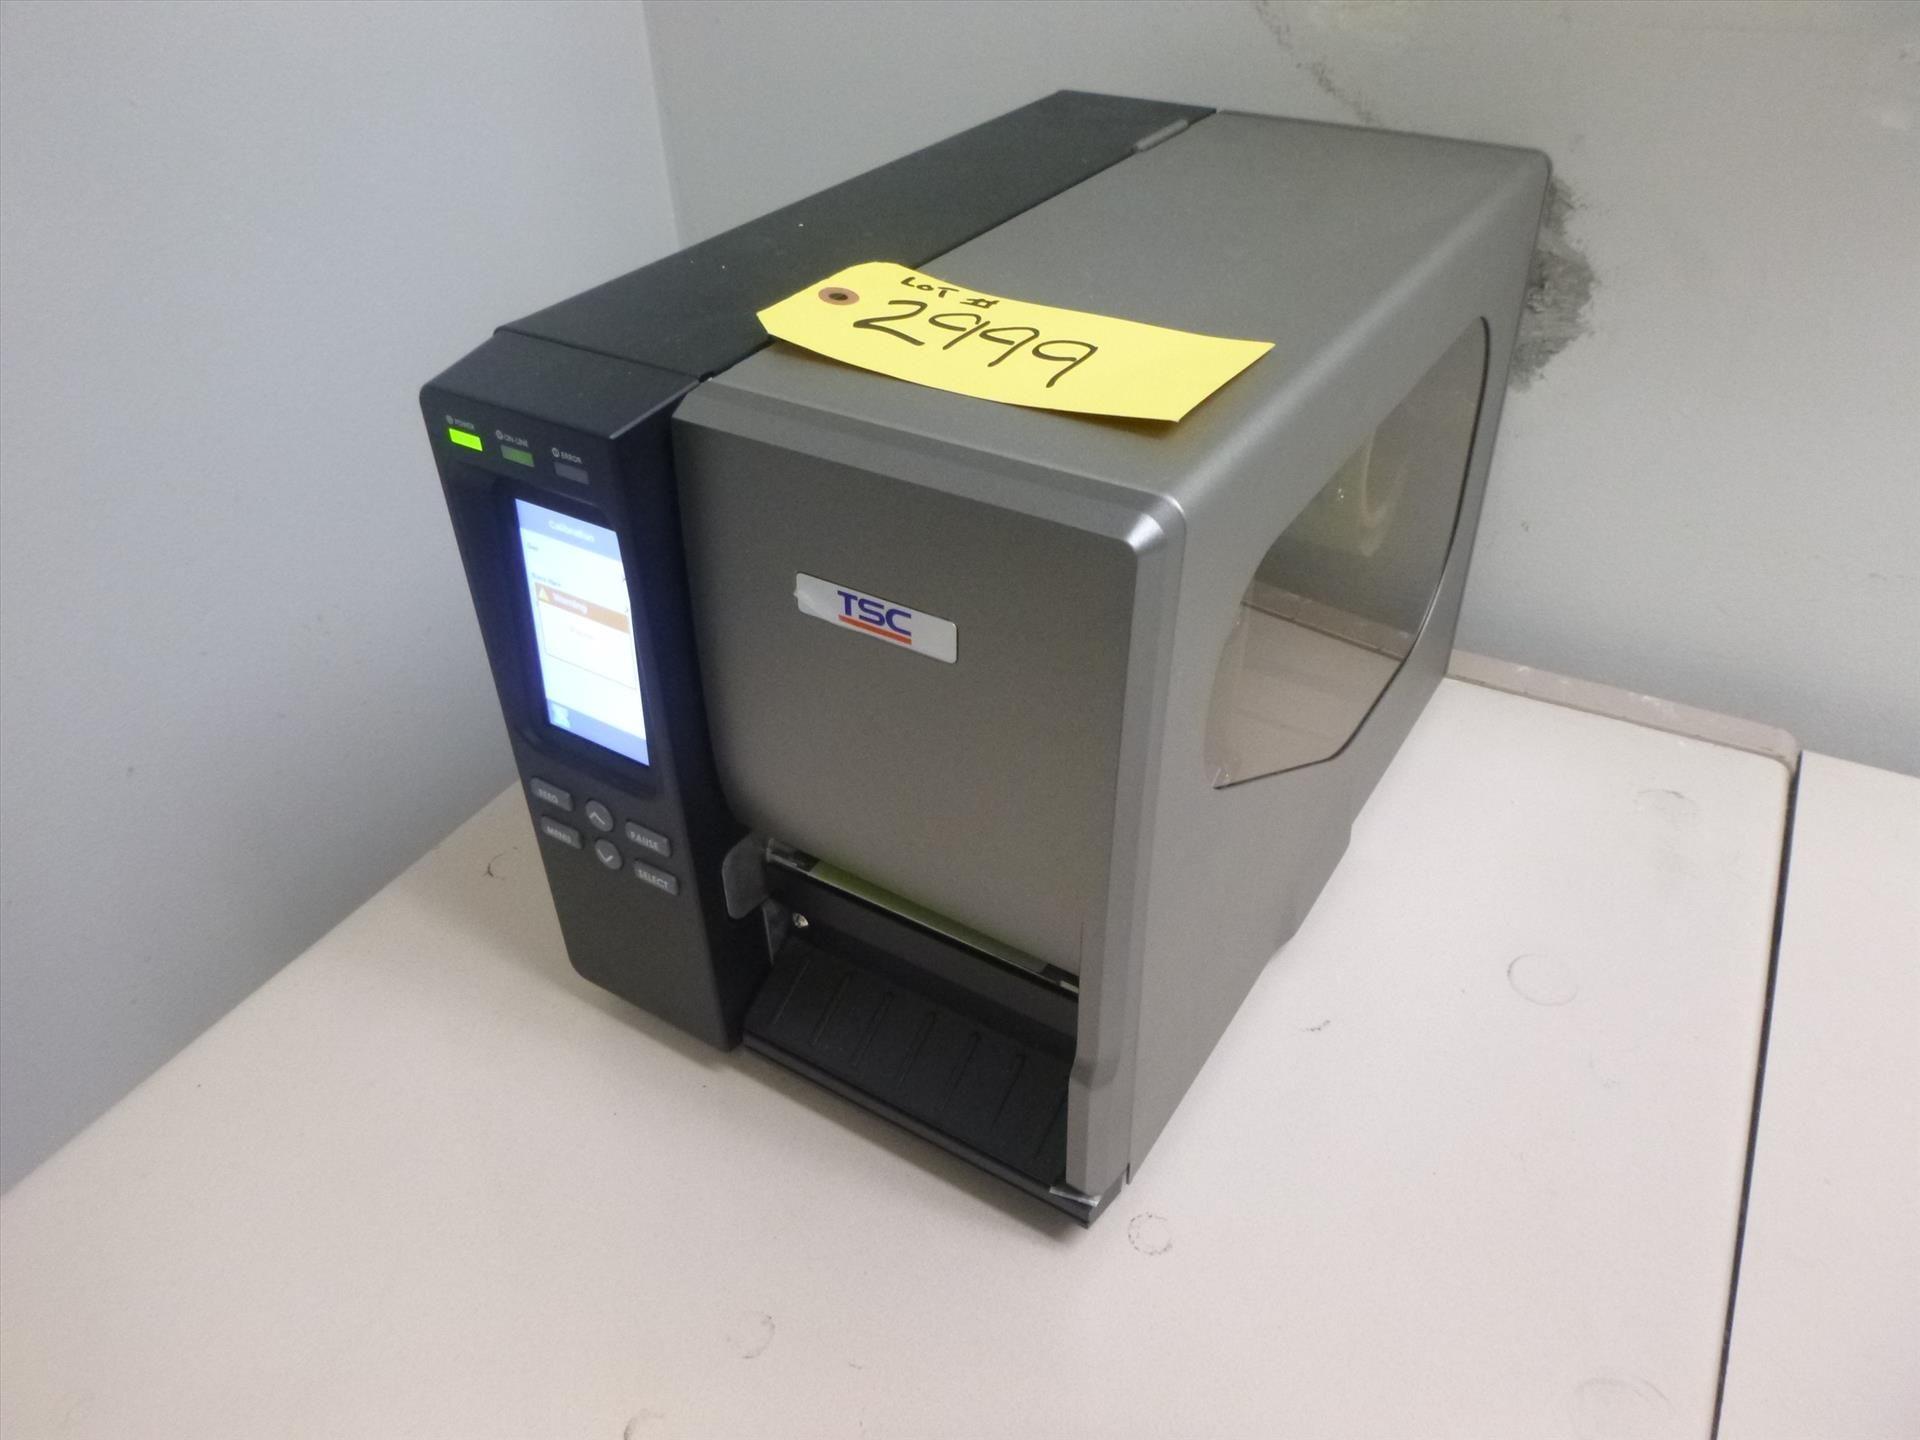 Lot 2999 - TSC label printer [2nd Floor]